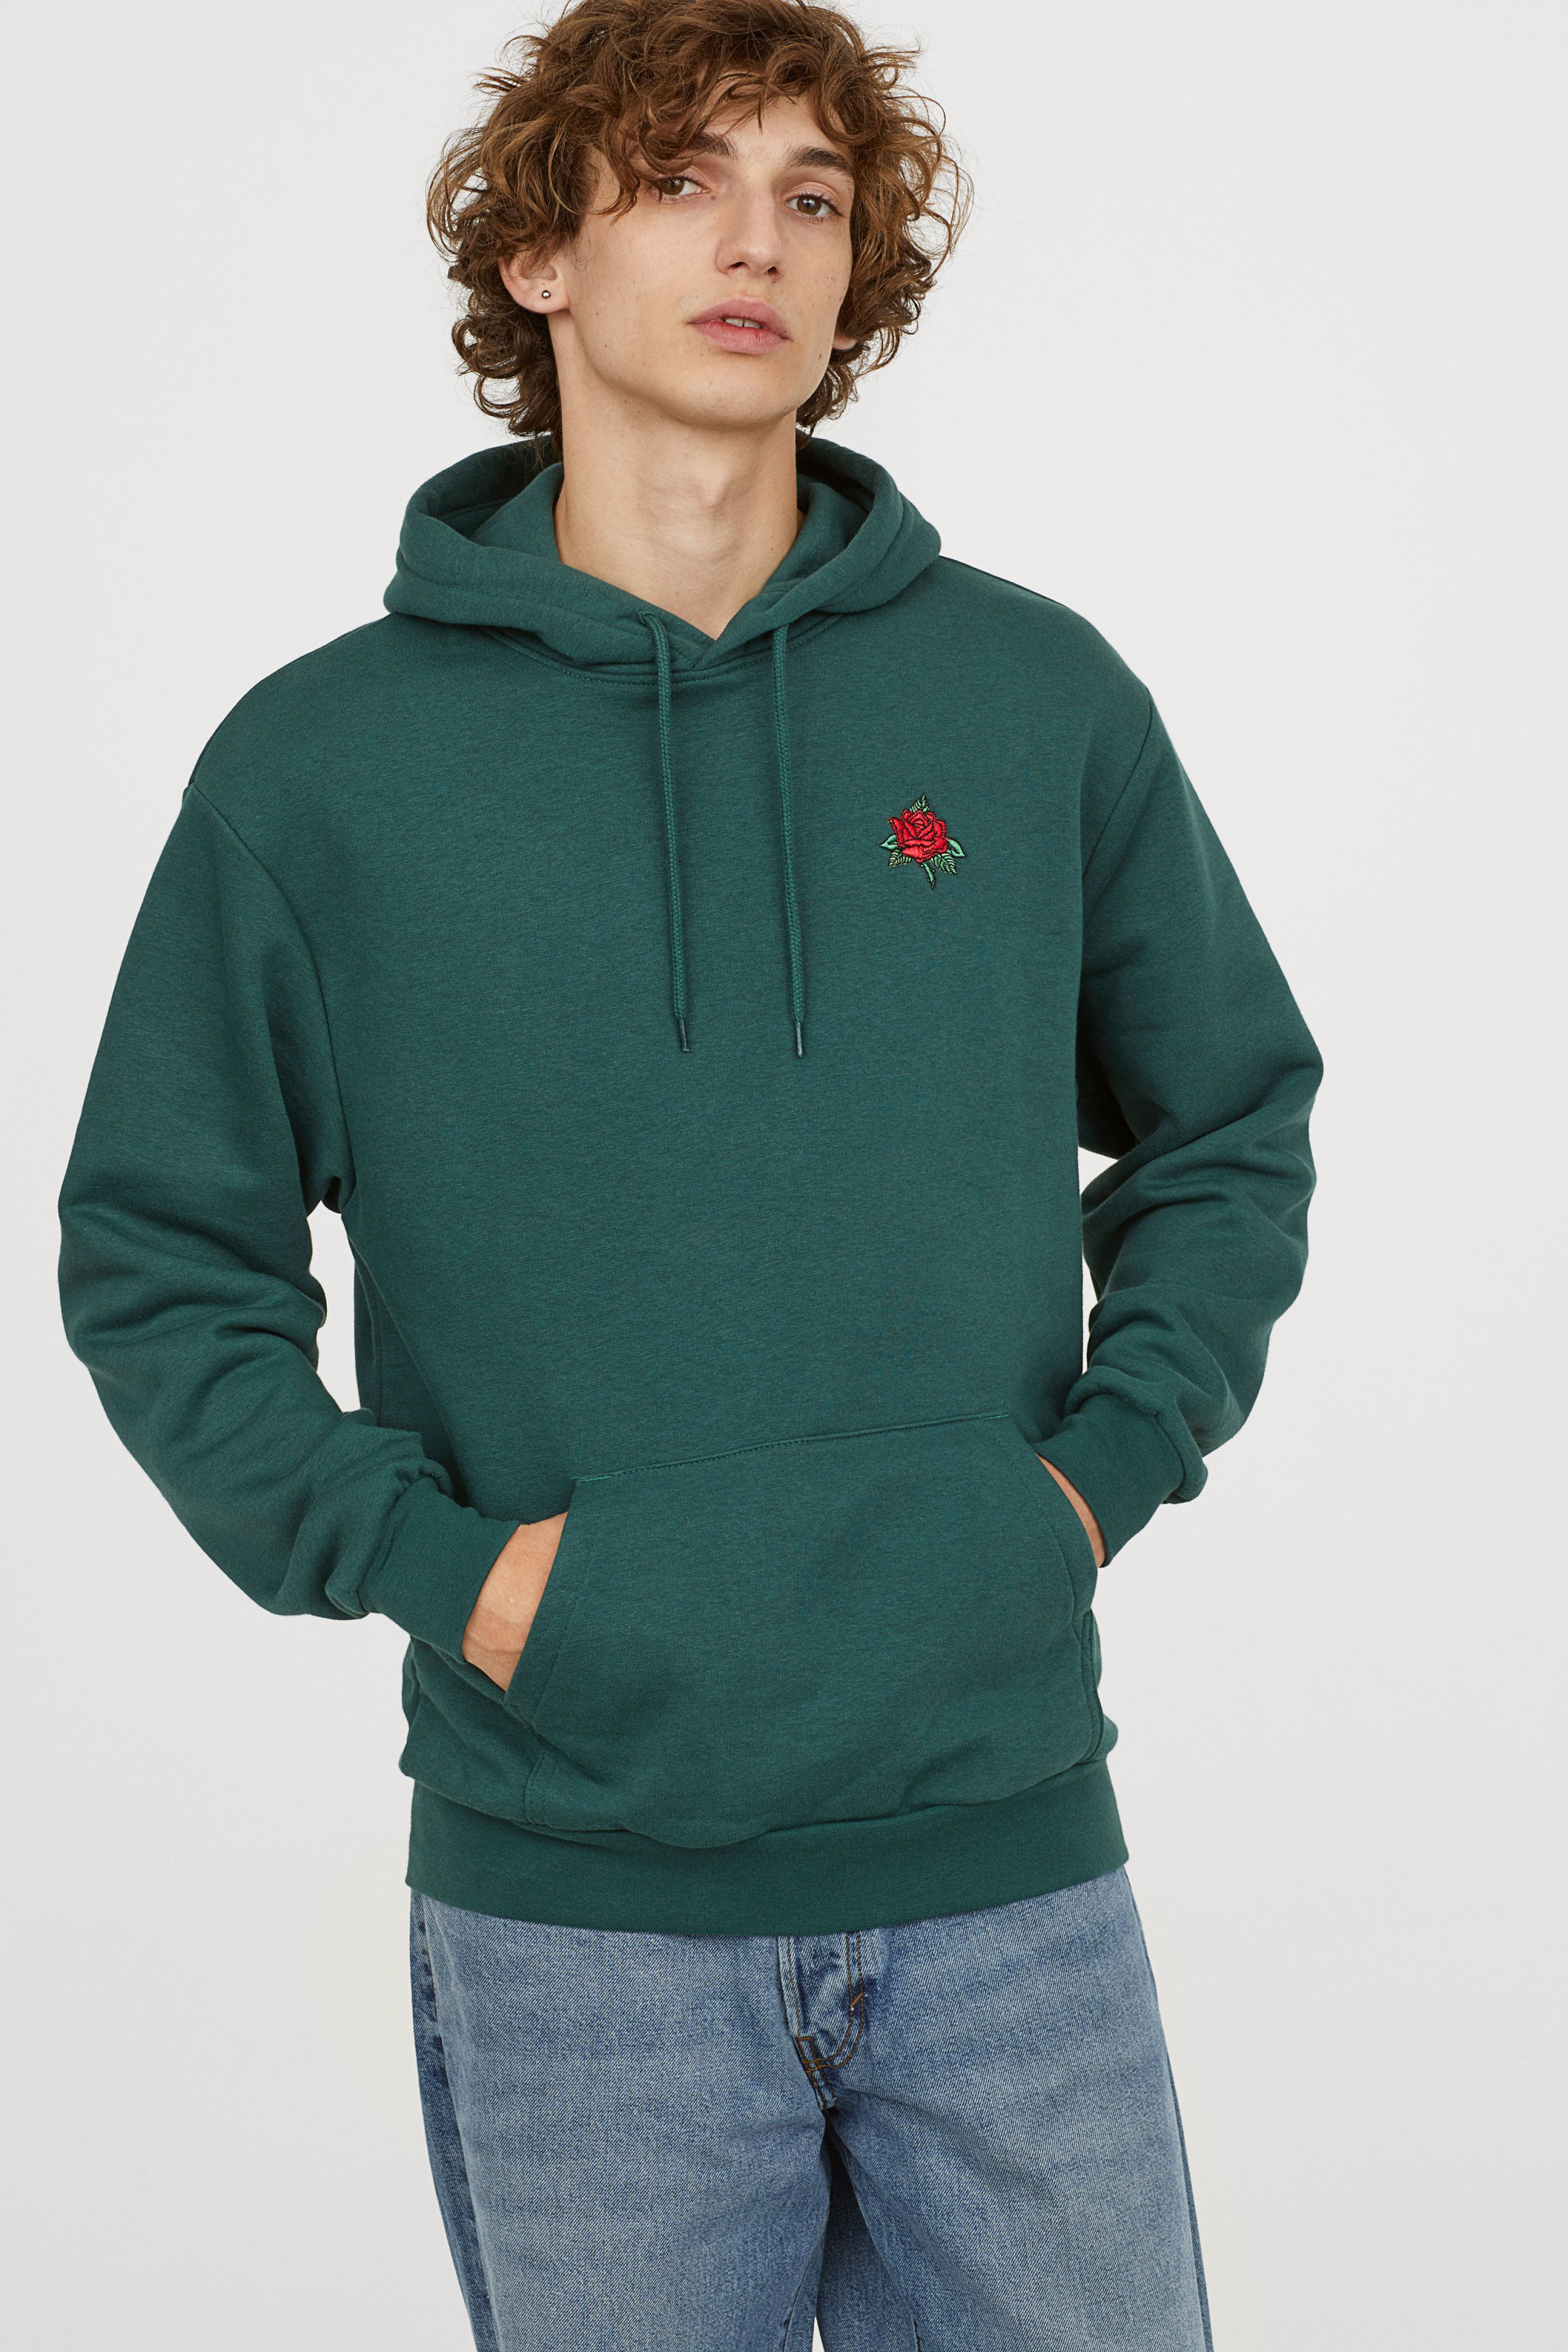 Pin By Cate Strub On Boys Shopping Trip Dark Green Hoodie Hoodies H M Men [ 4320 x 2880 Pixel ]